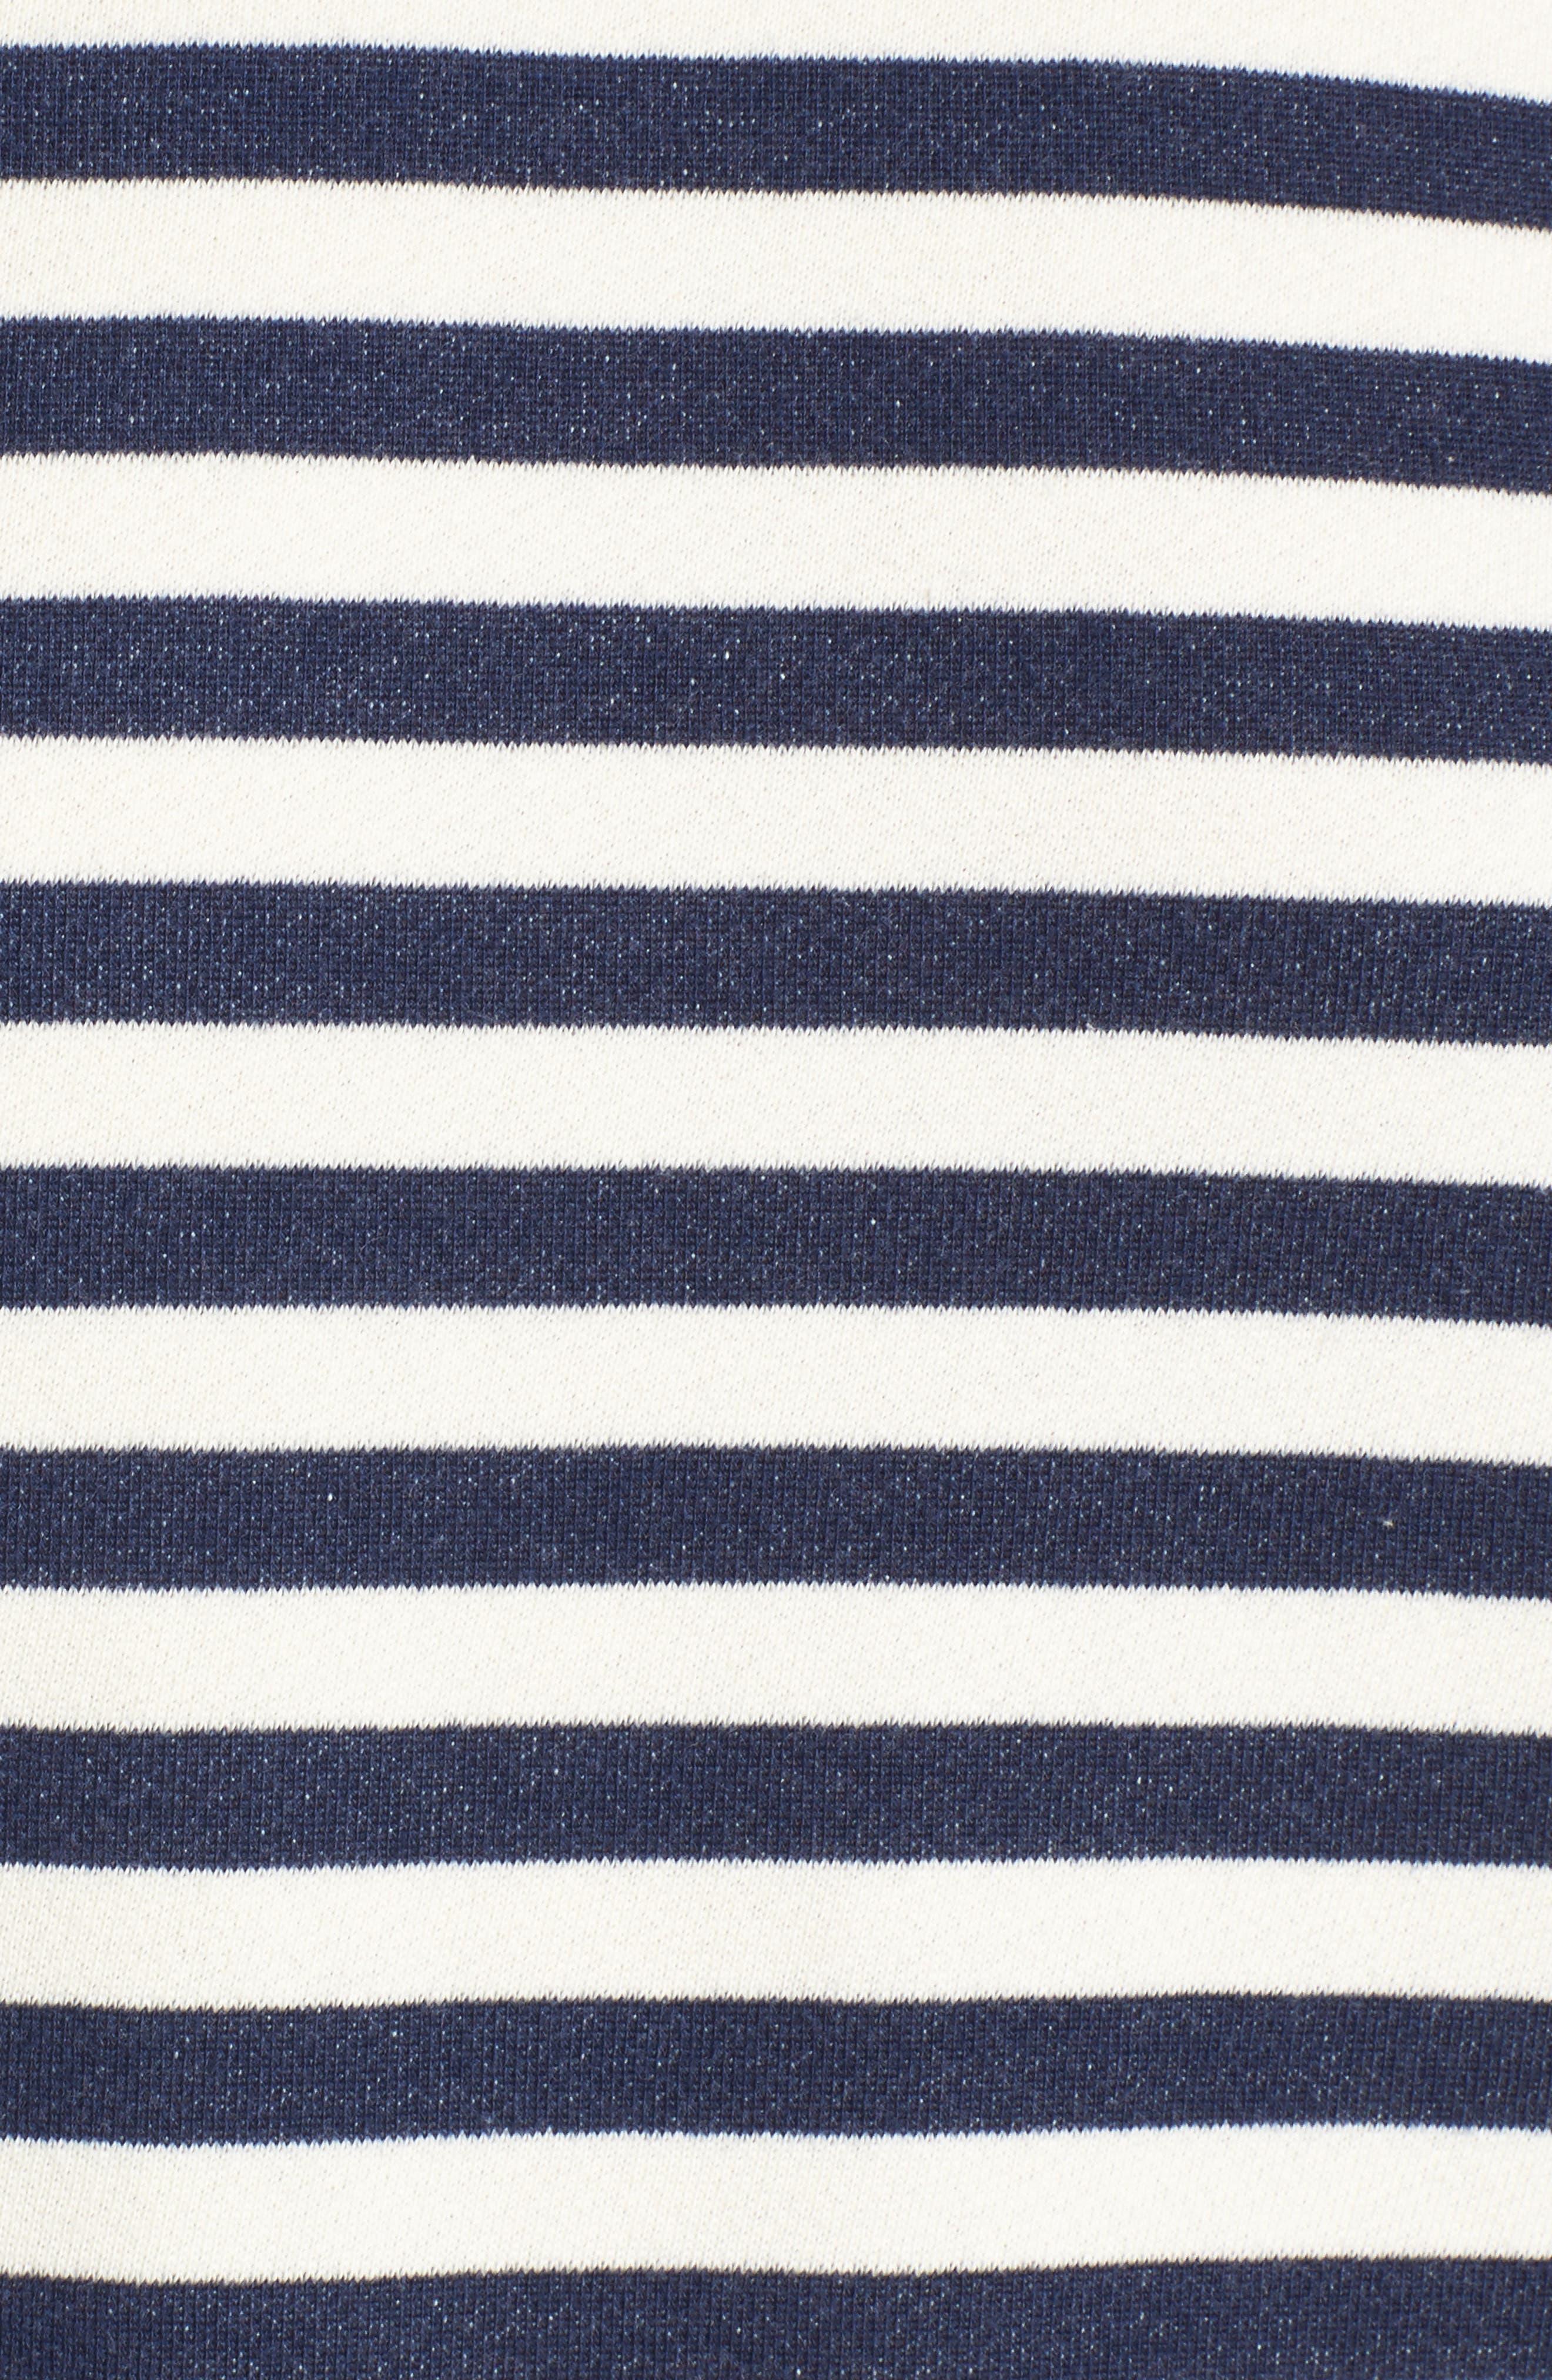 Tie Sleeve Sweatshirt,                             Alternate thumbnail 5, color,                             Navy/ Ivory Stripe